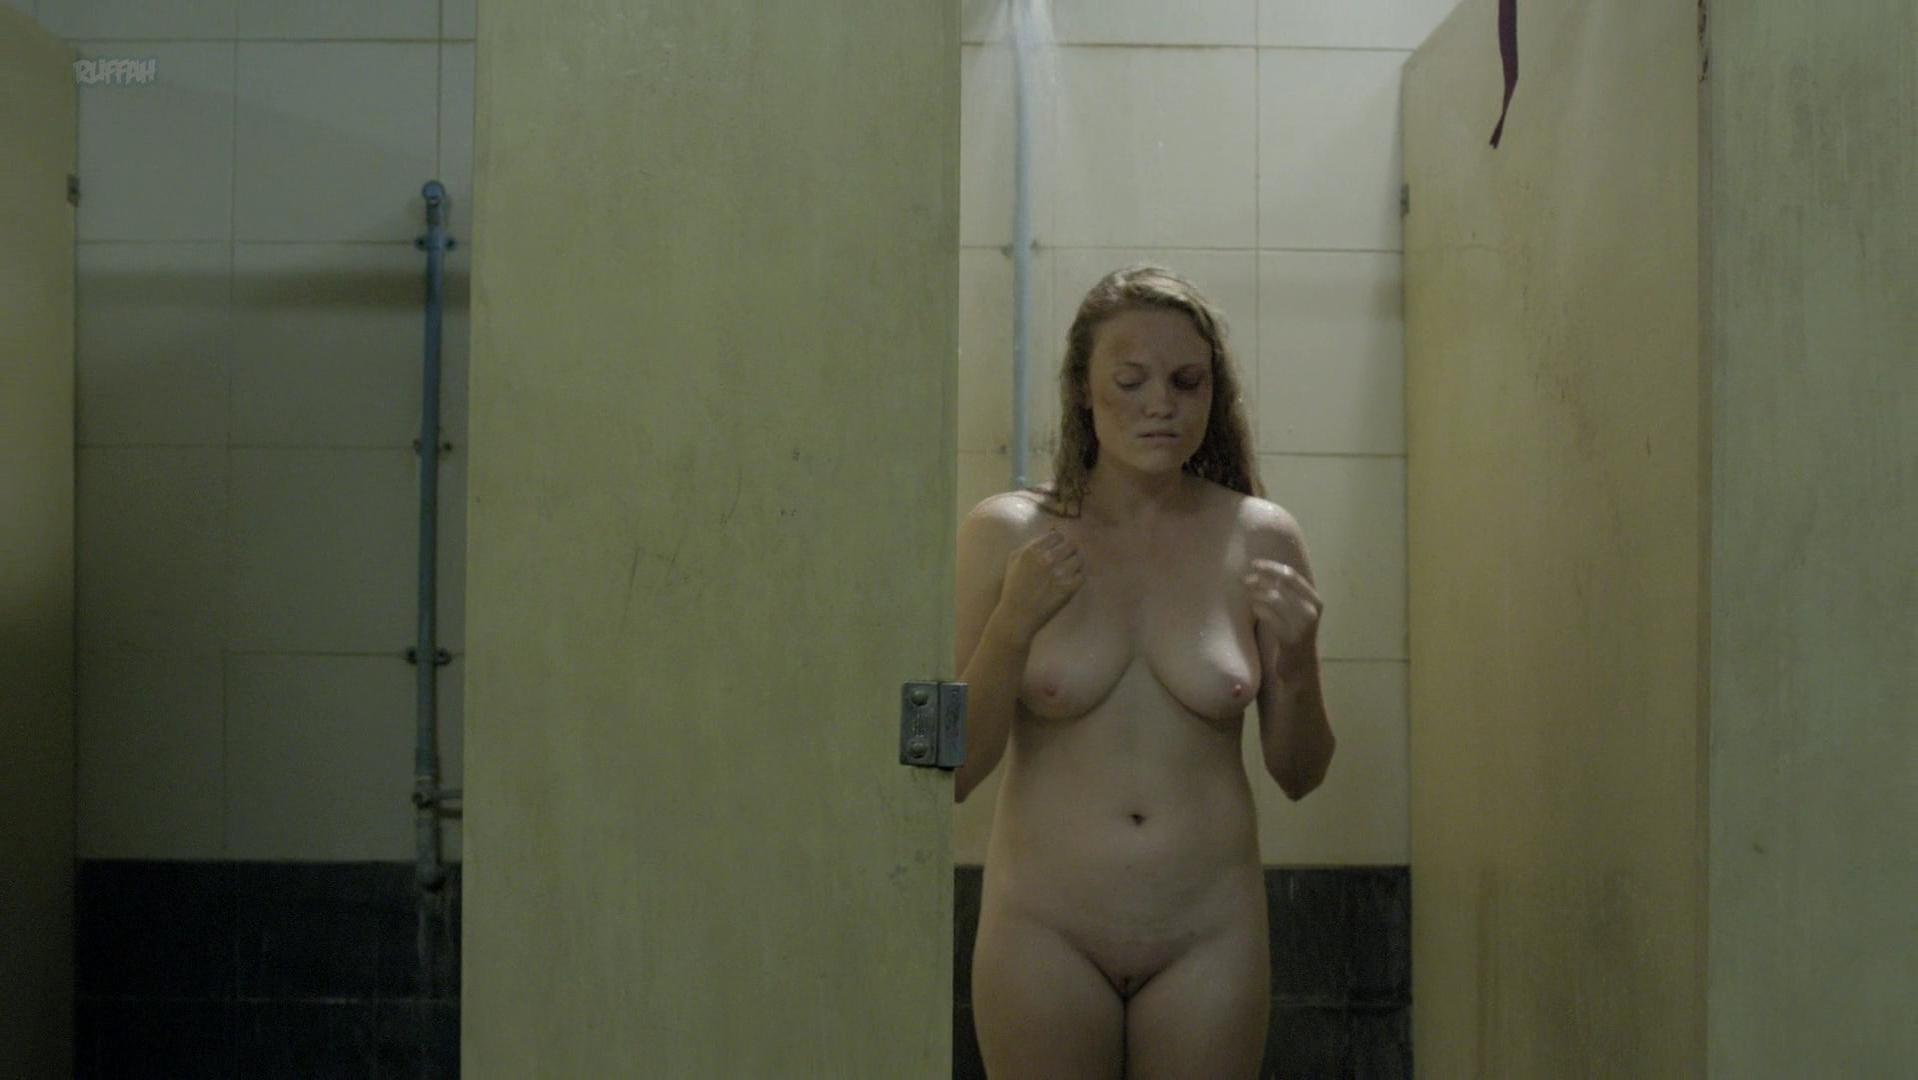 Kelly McCart nude, Katrina Grey nude, Kat Ingkarat nude, Uraipon Yomglang nude - Locked Up (2017)